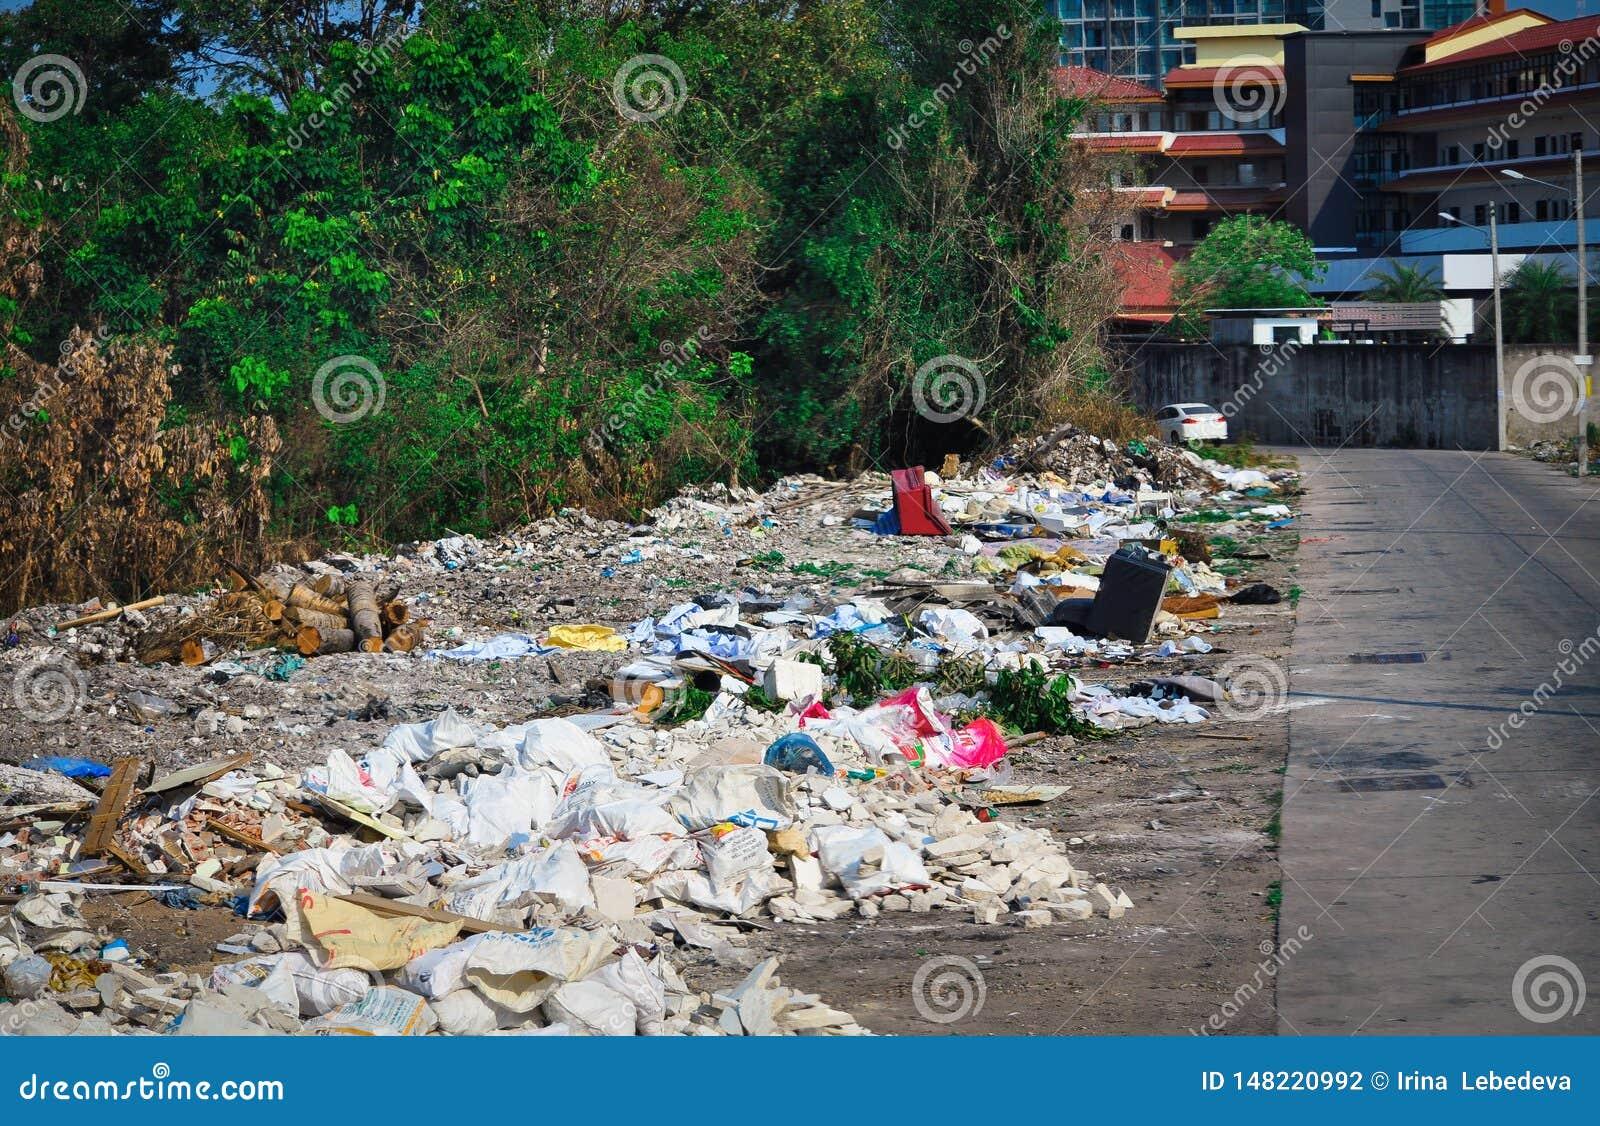 Descarga de lixo nas ruas de Pattaya em Tailândia